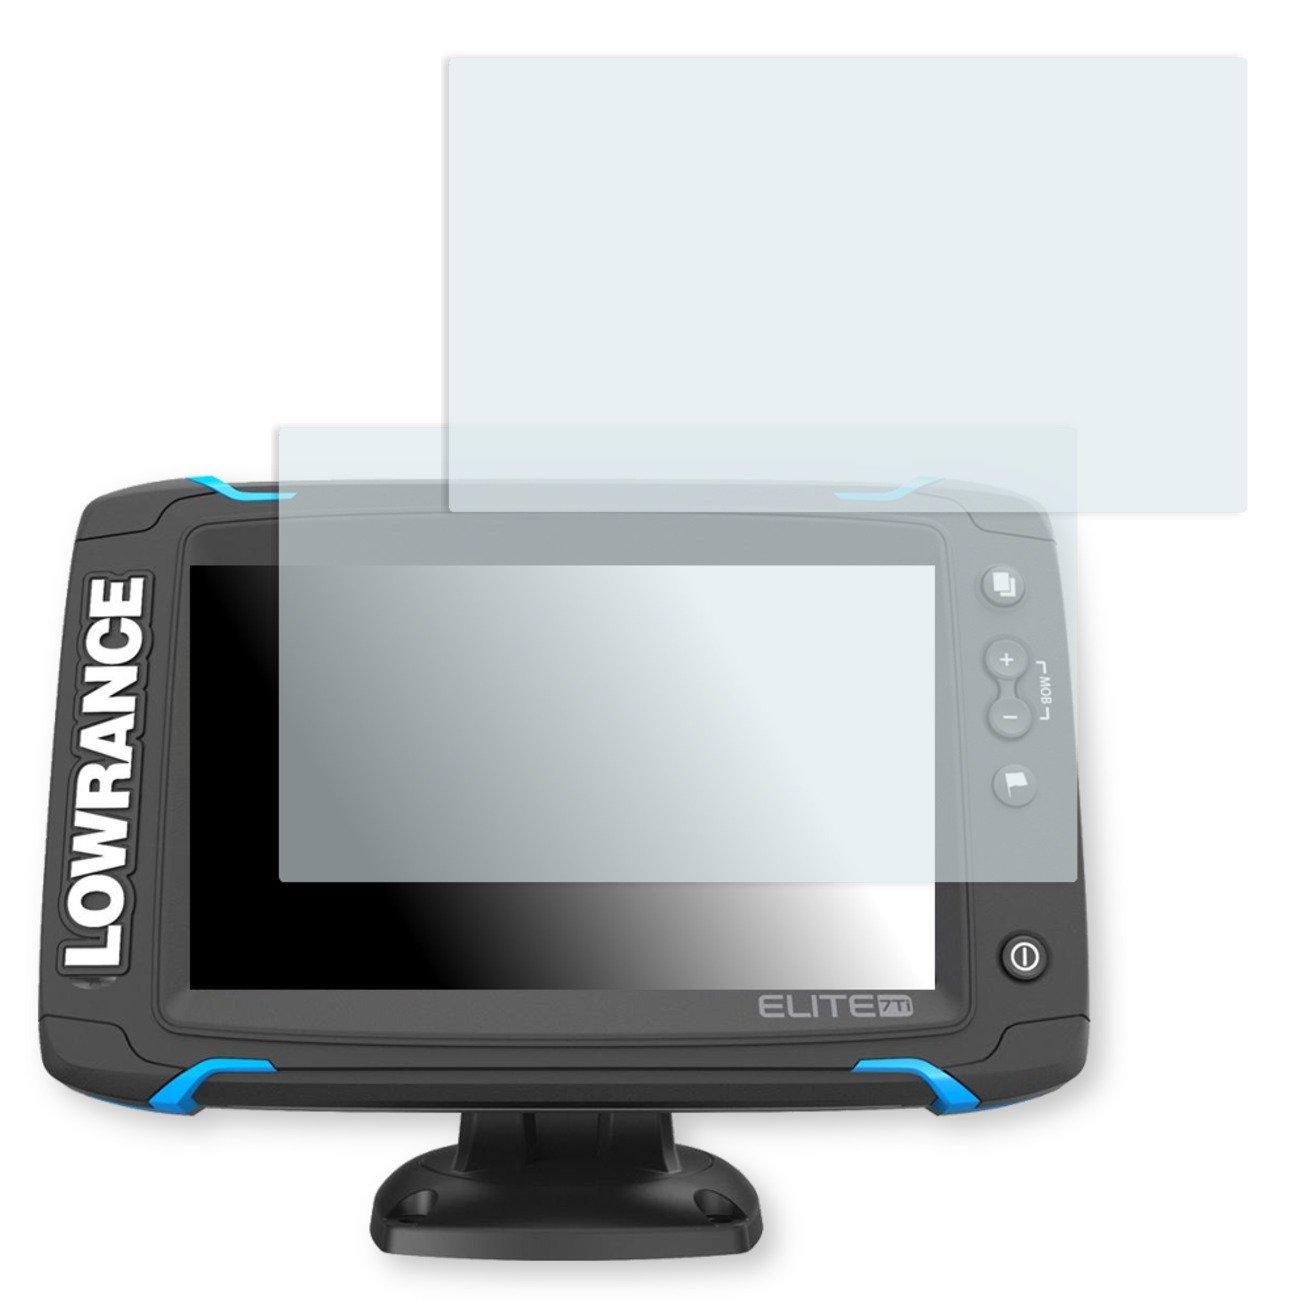 GOLEBO 2X Anti-Glare Screen Protector for Lowrance Elite-7 (Anti-Reflex, Air Pocket Free Application, Easy to Remove)